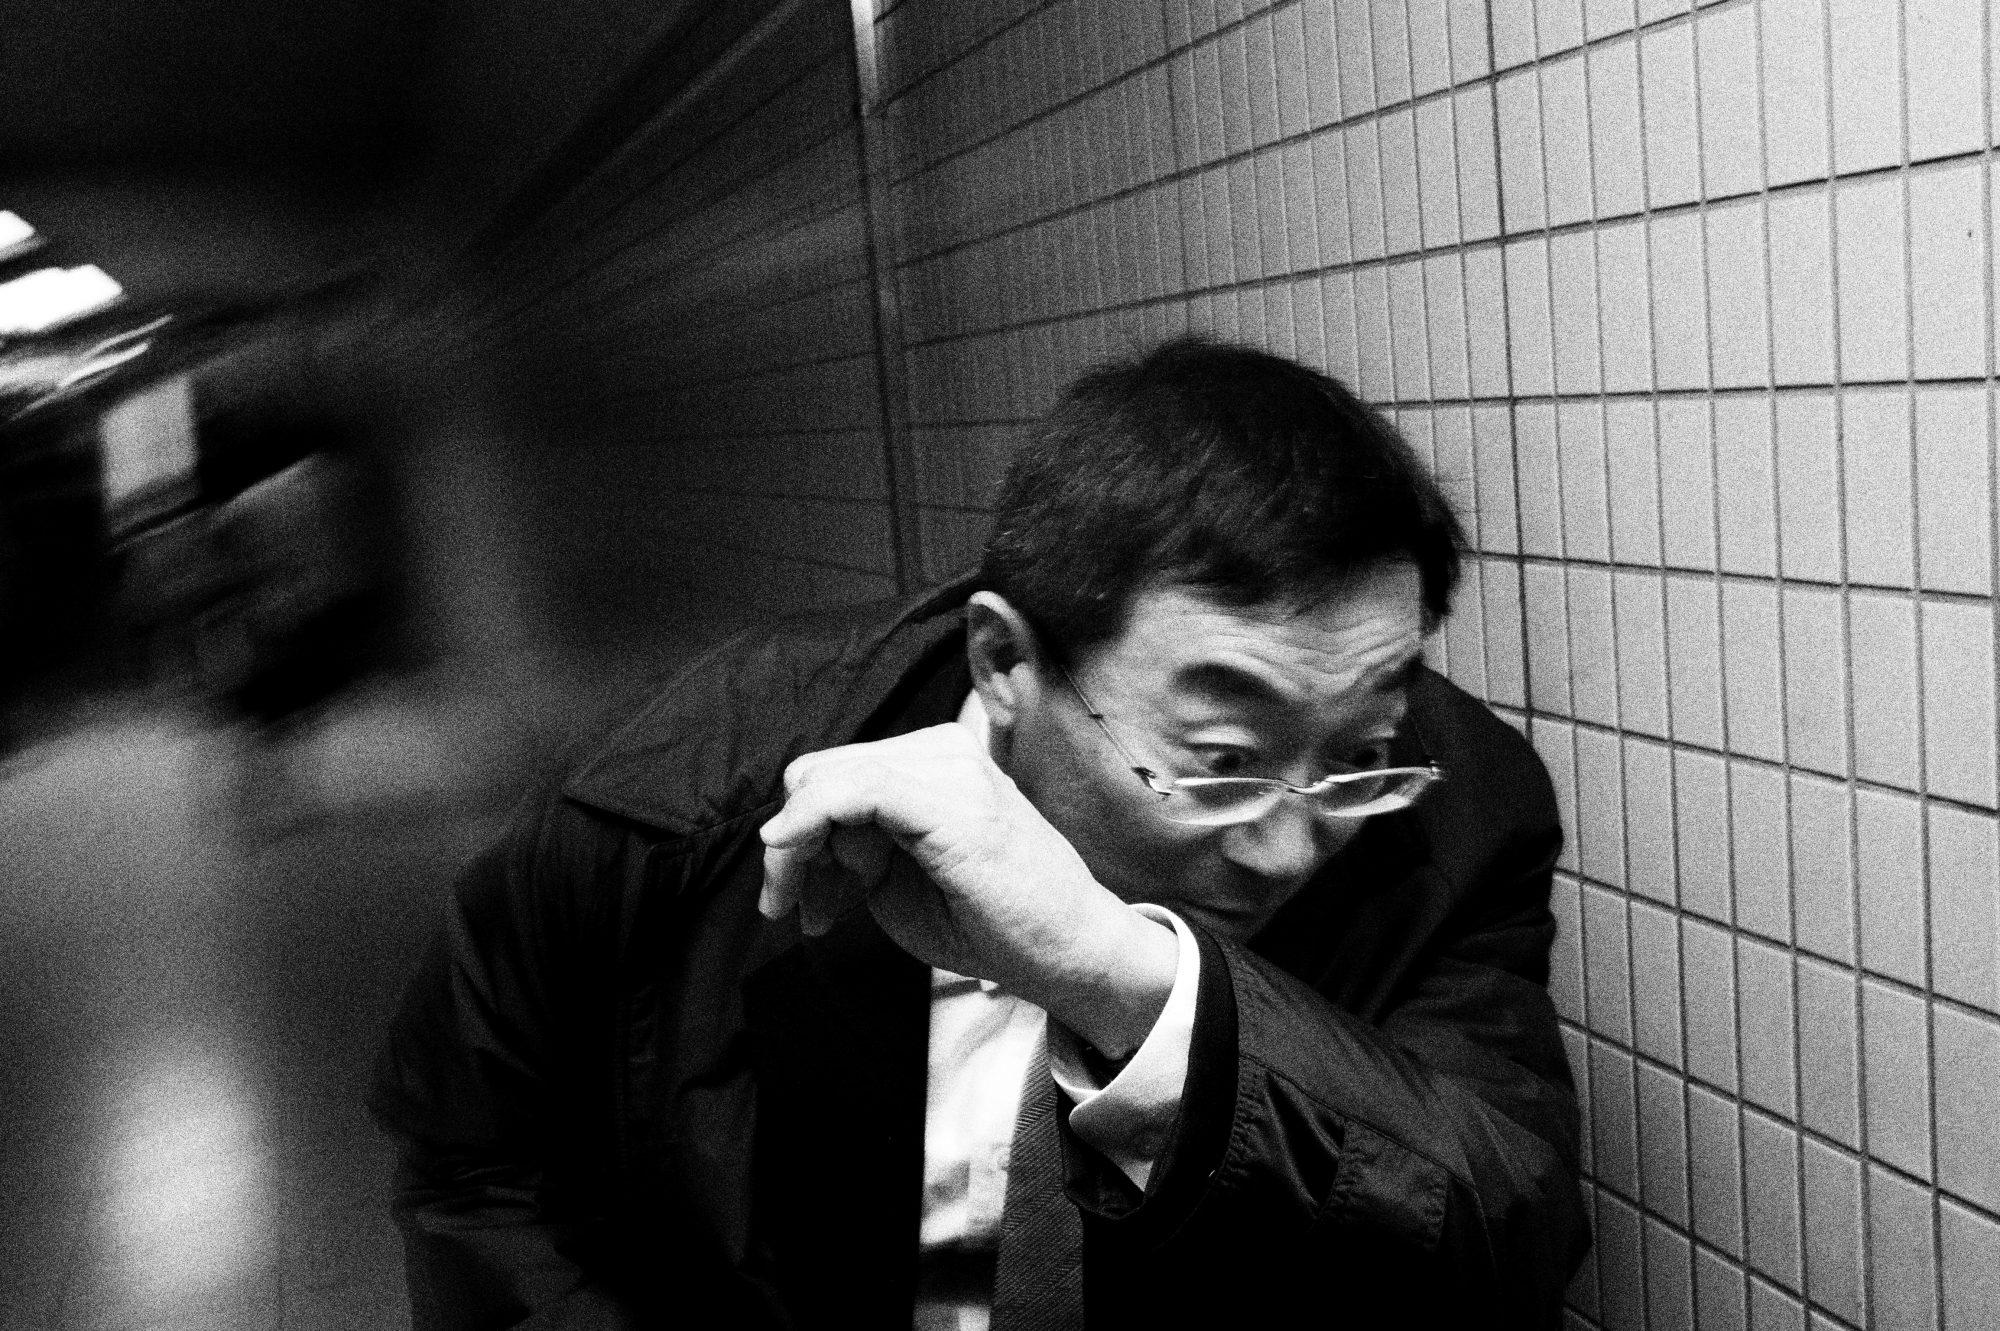 Tokyo, 2012